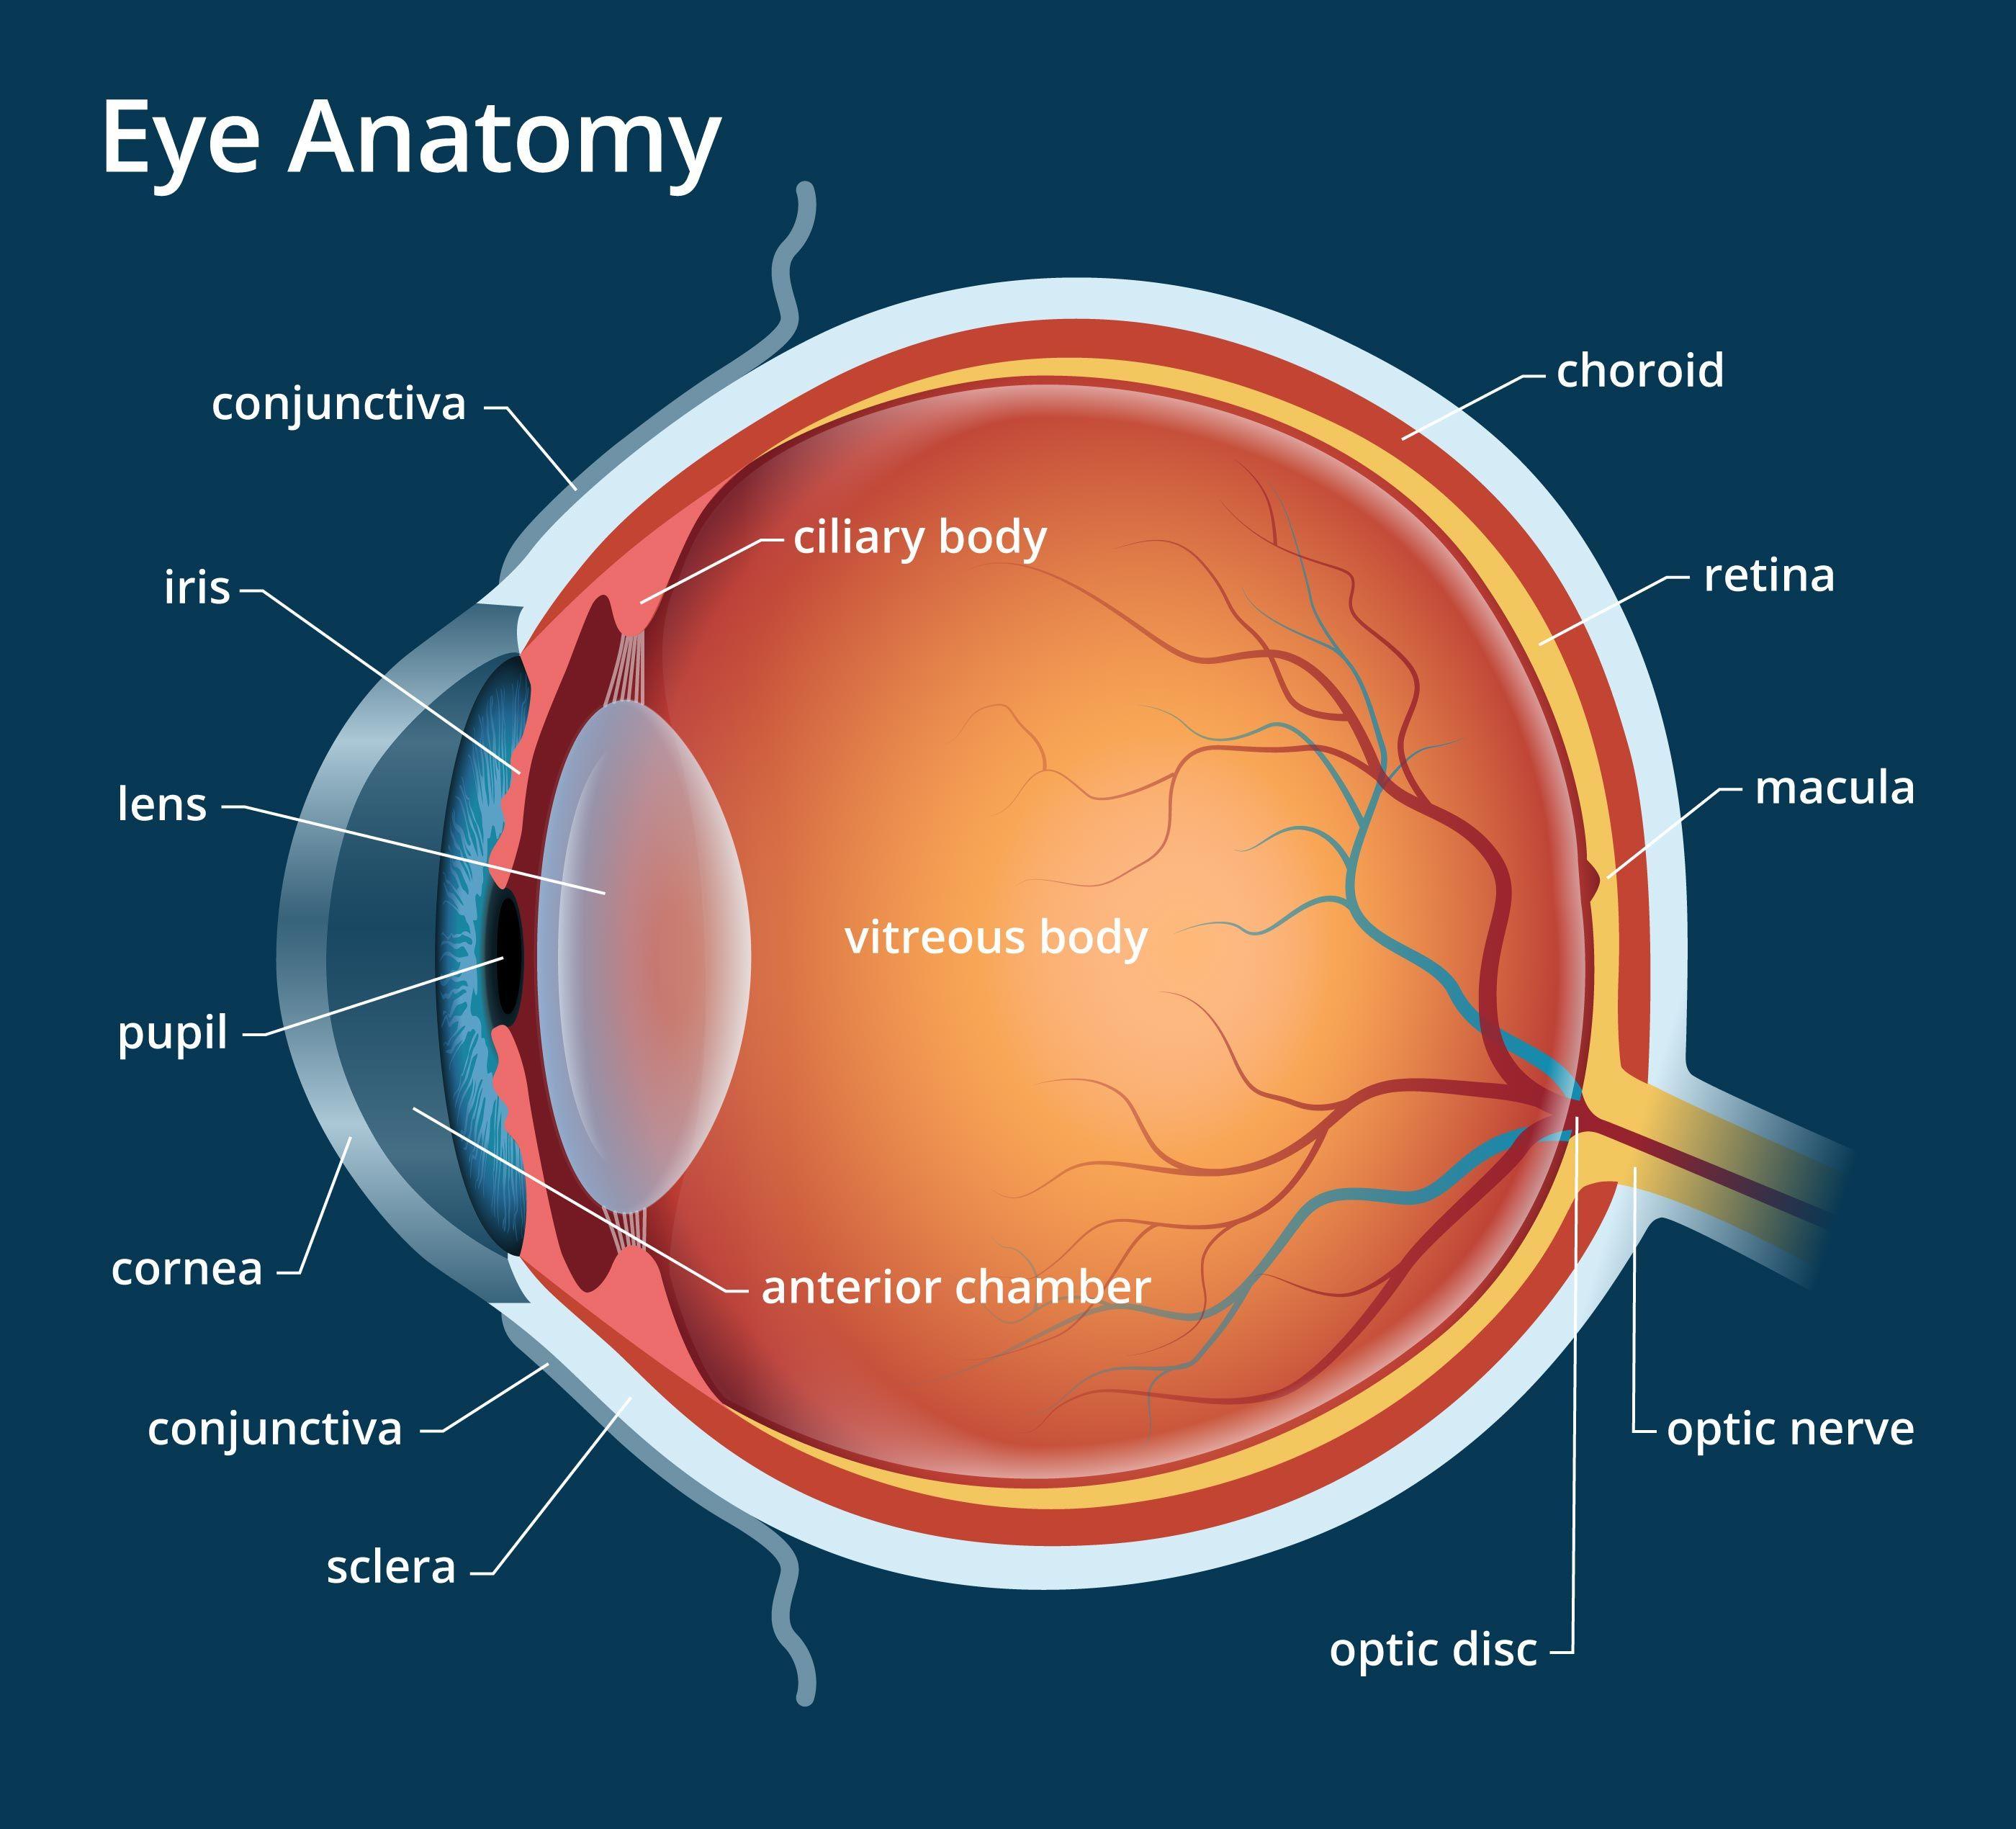 hight resolution of human eye anatomy parts of the eye explained bluetooth electronics consumer electronics